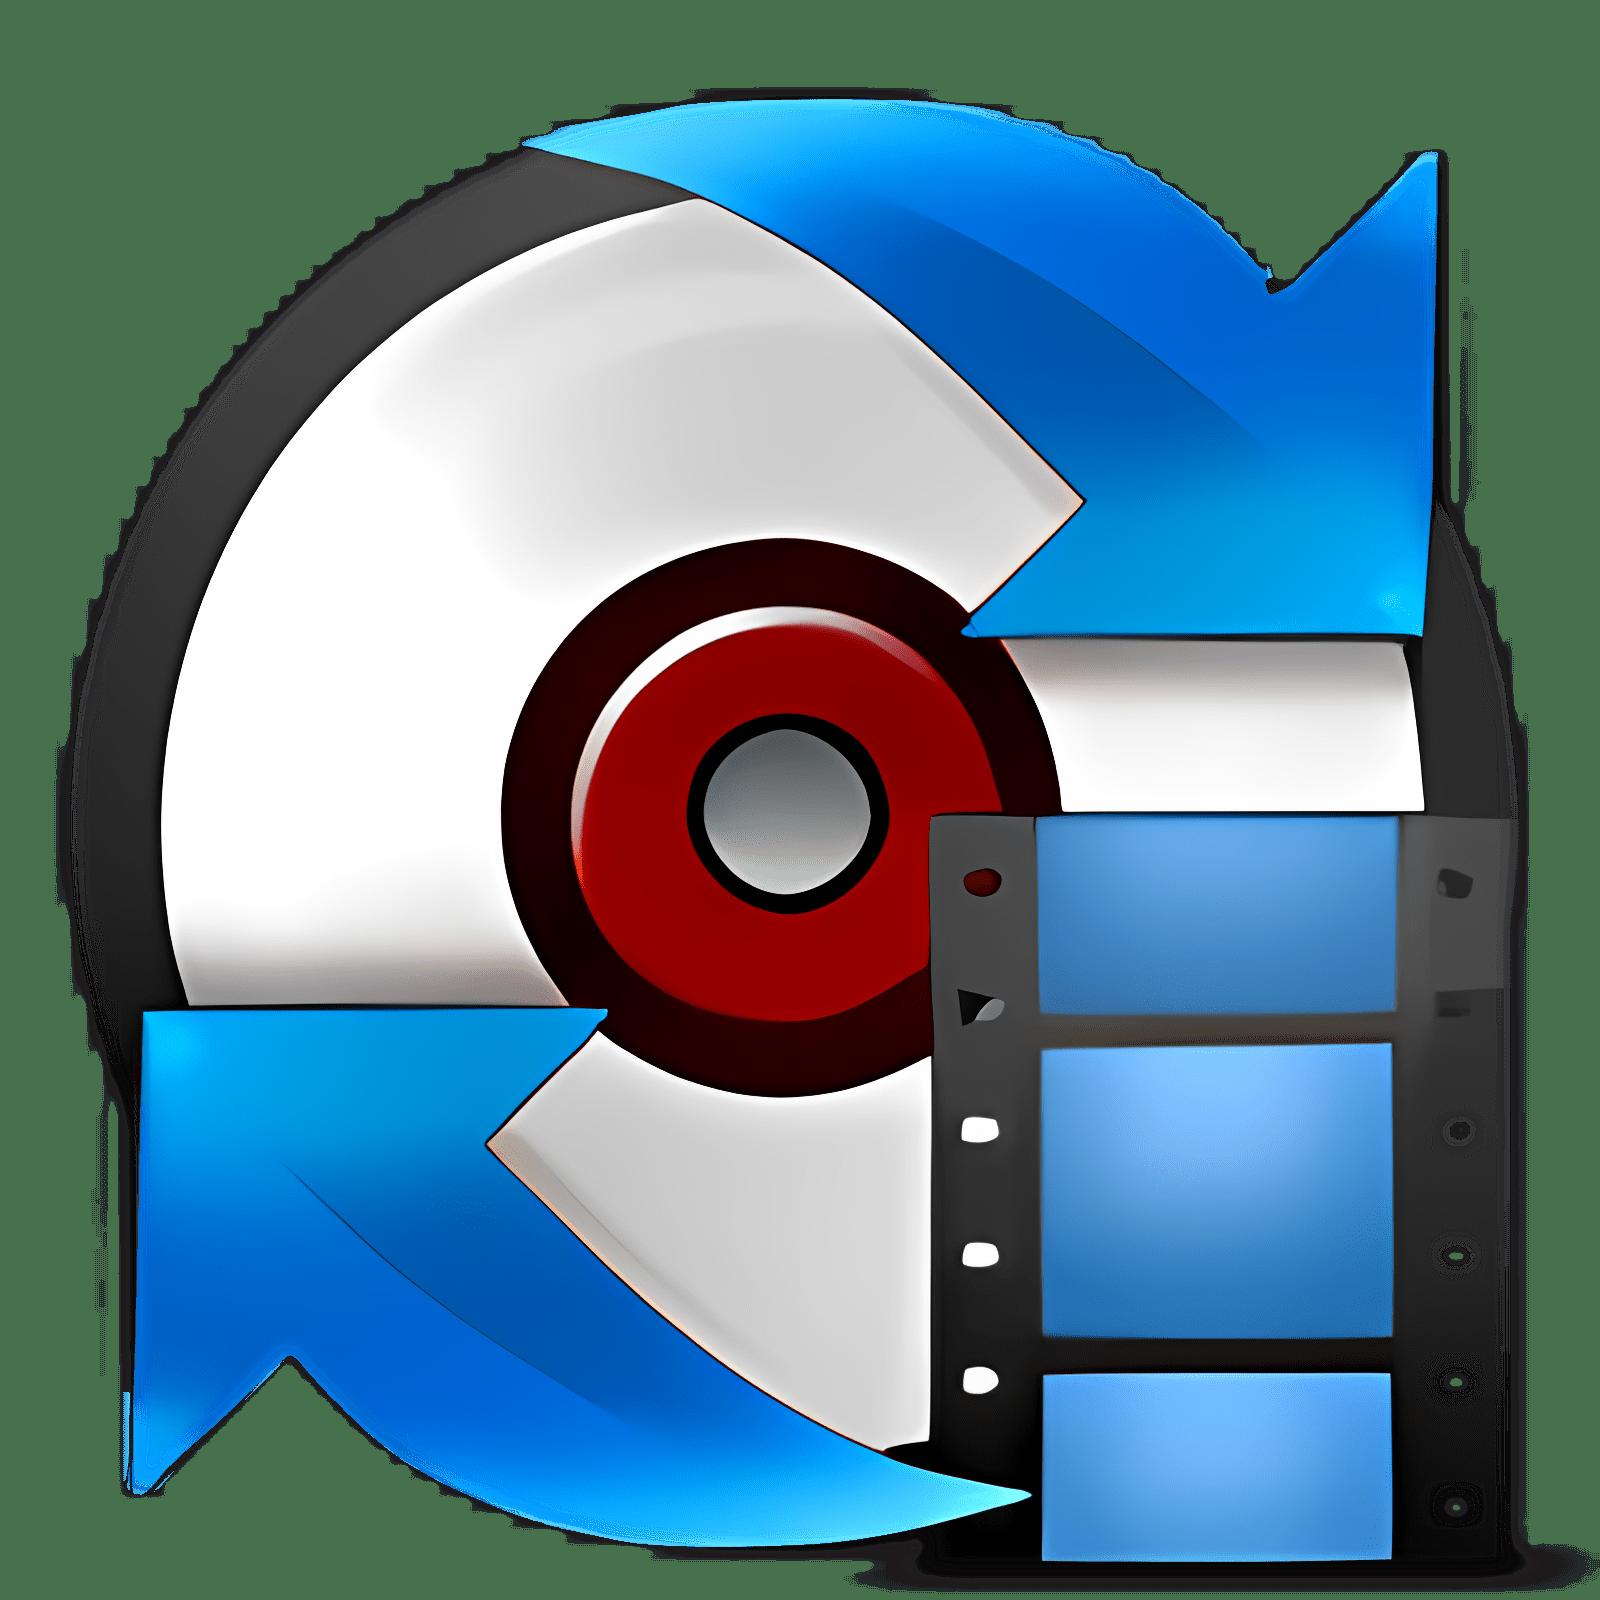 Aiseesoft BD Software Toolkit